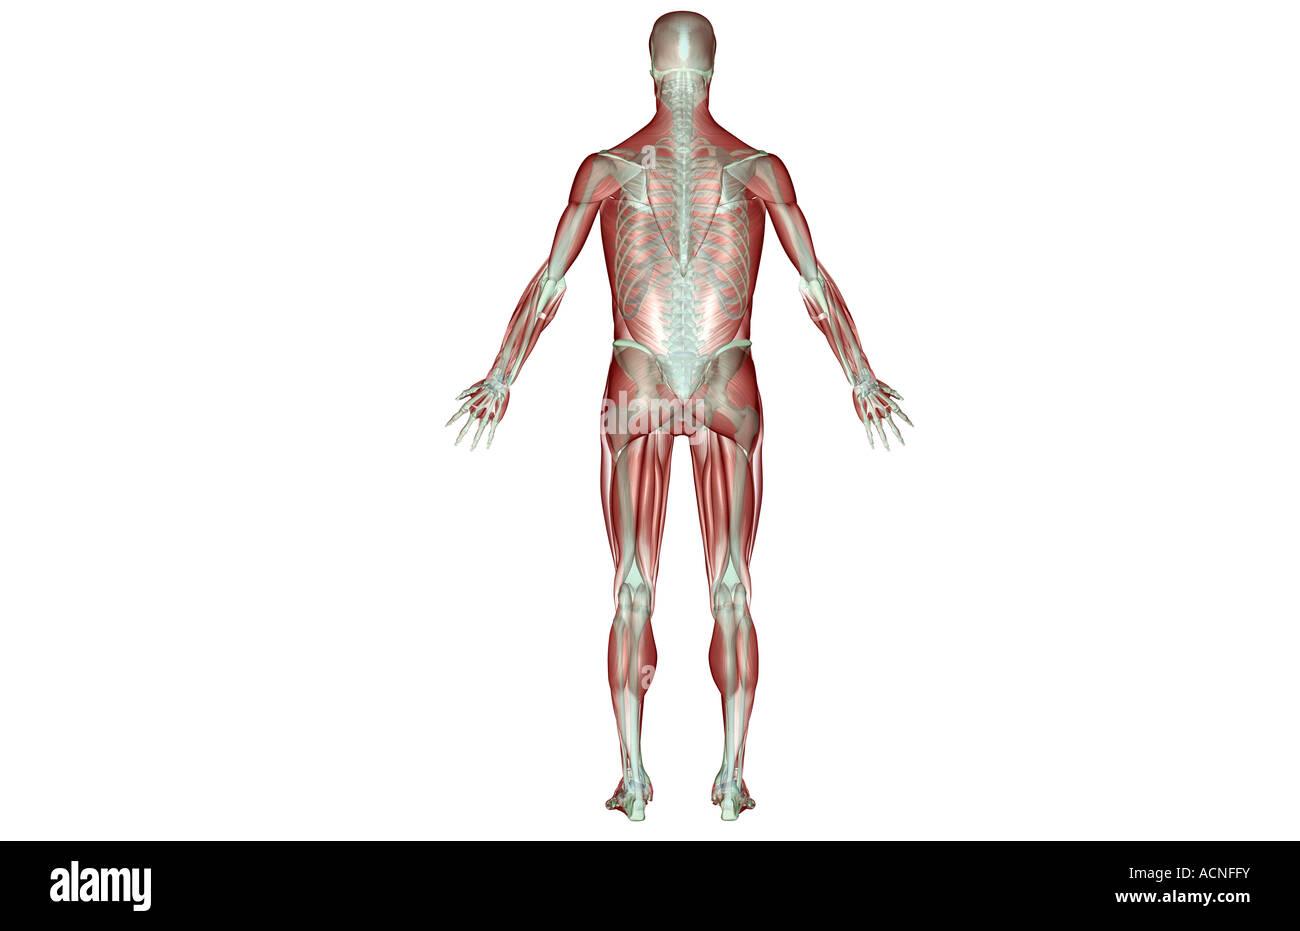 Das Muskel-Skelett-system Stockfoto, Bild: 13198382 - Alamy